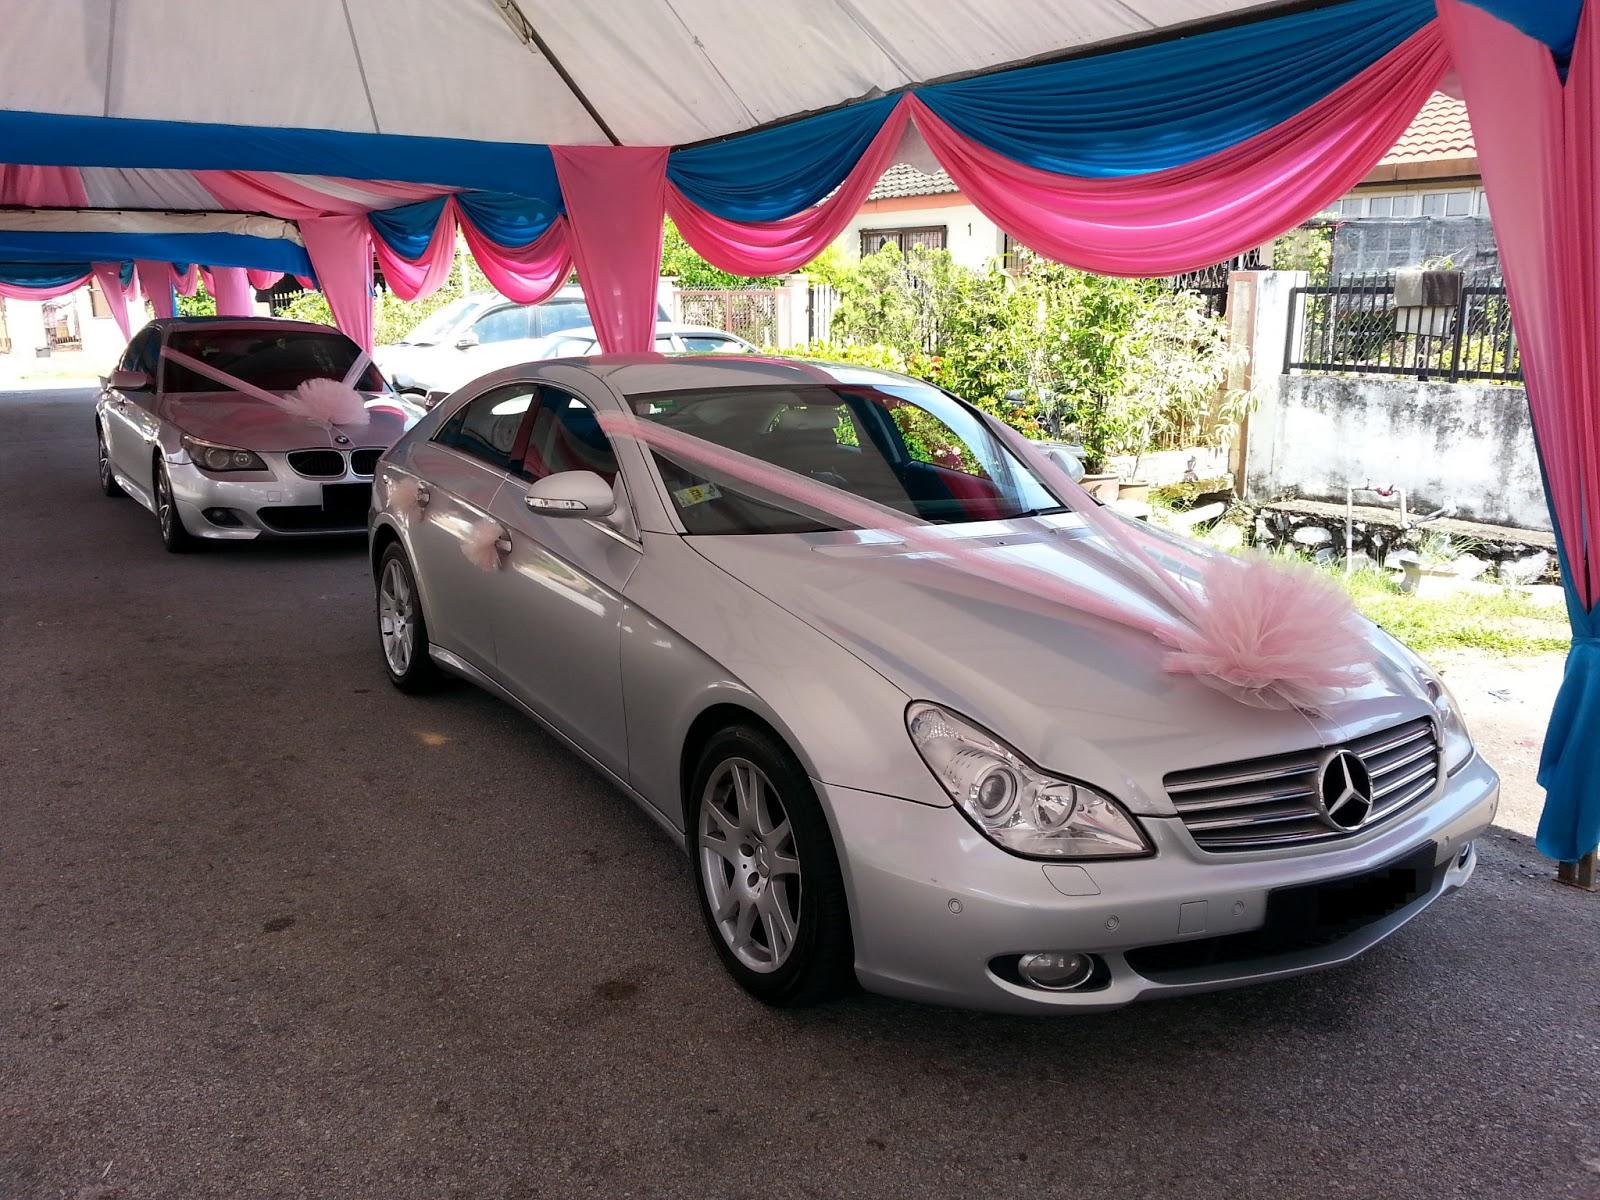 Rent bmw for wedding